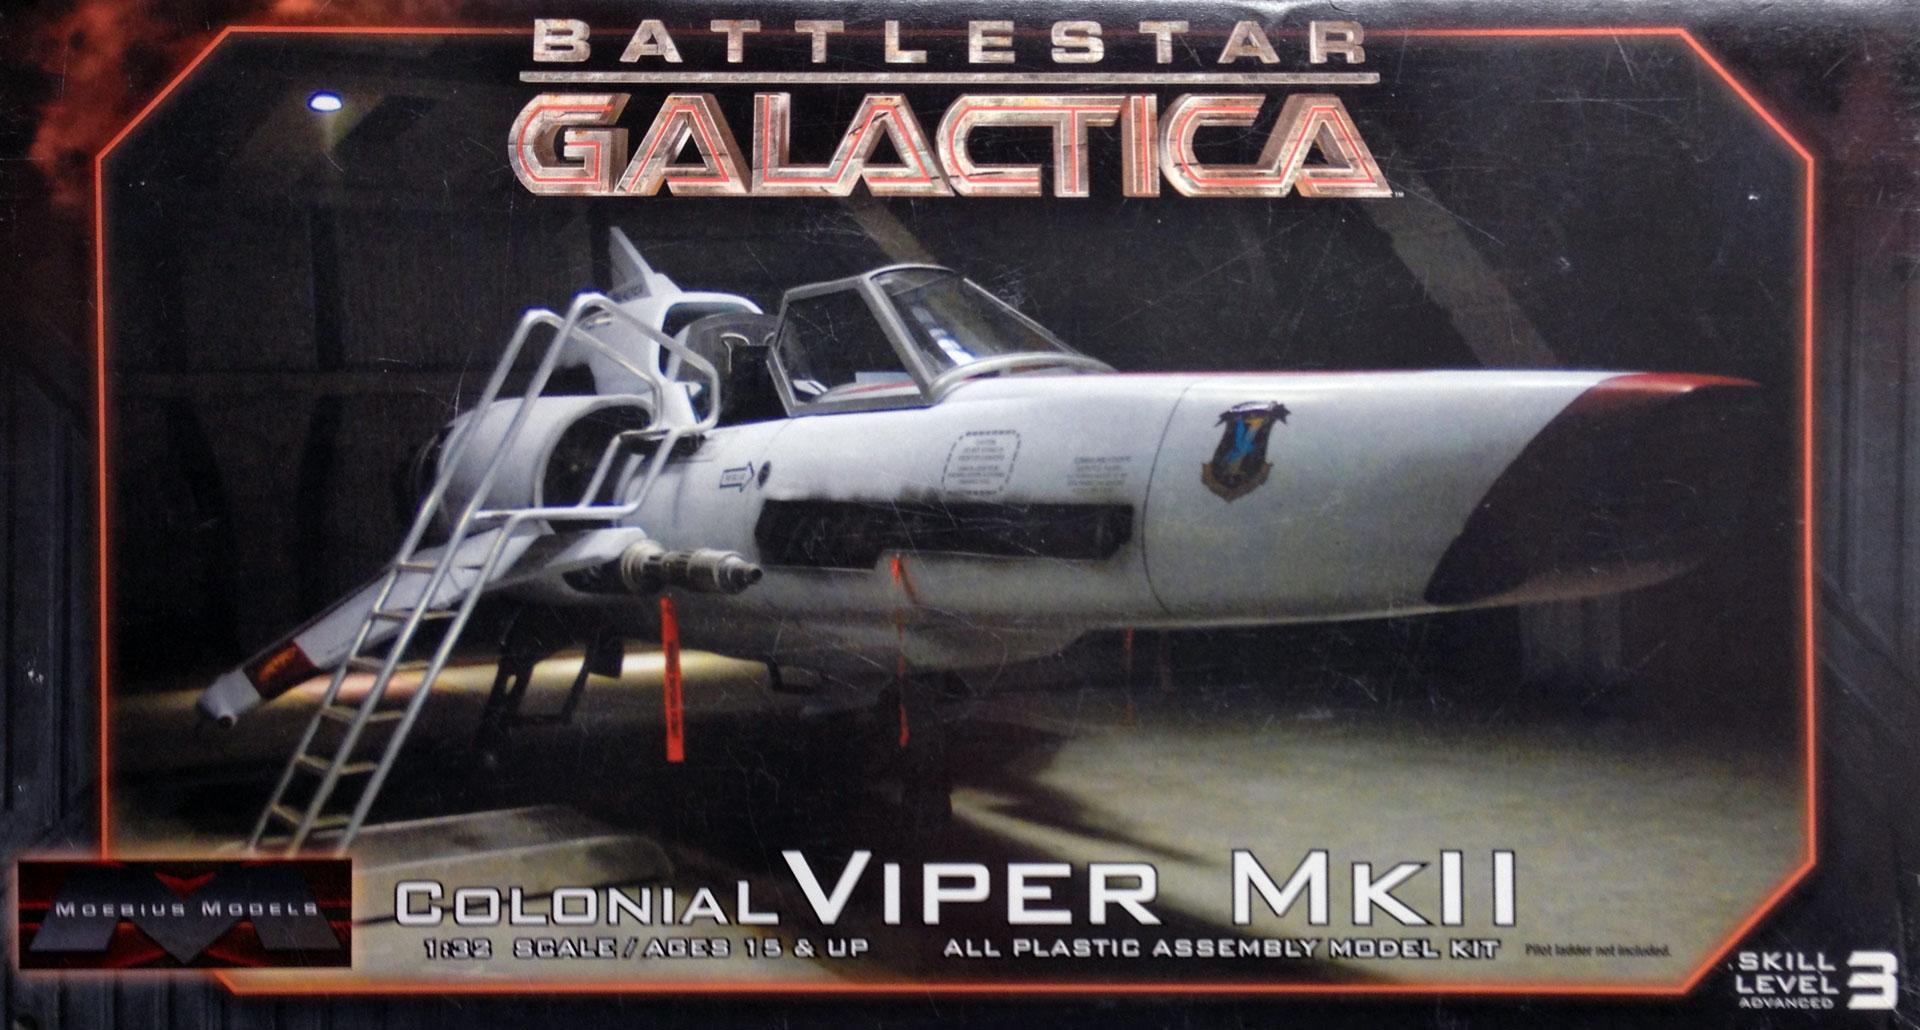 Moebius Battlestar Galactica Viper Mk II